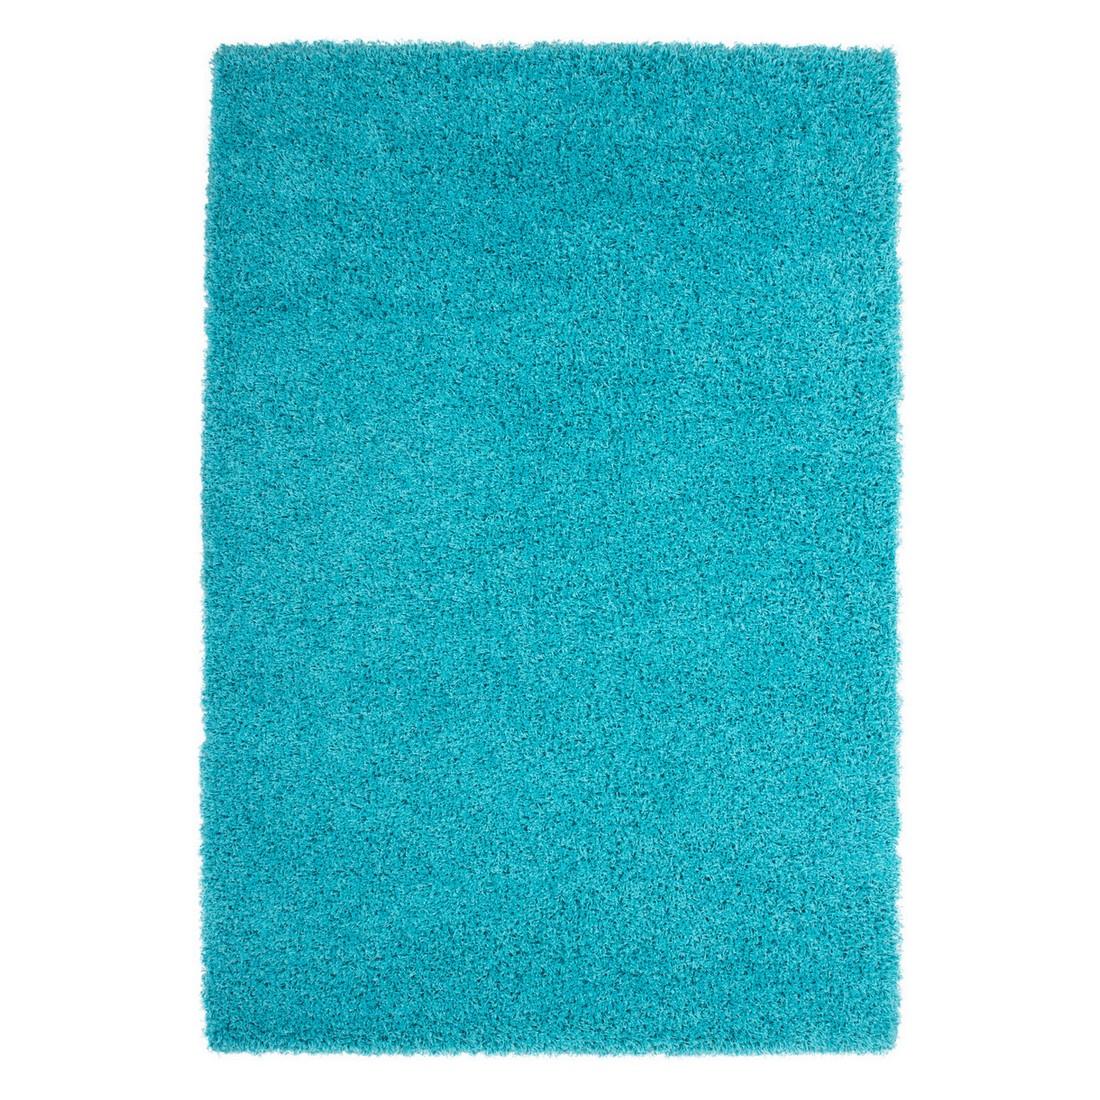 Teppich Salsa – Aqua – 120 x 170 cm, Obsession bestellen